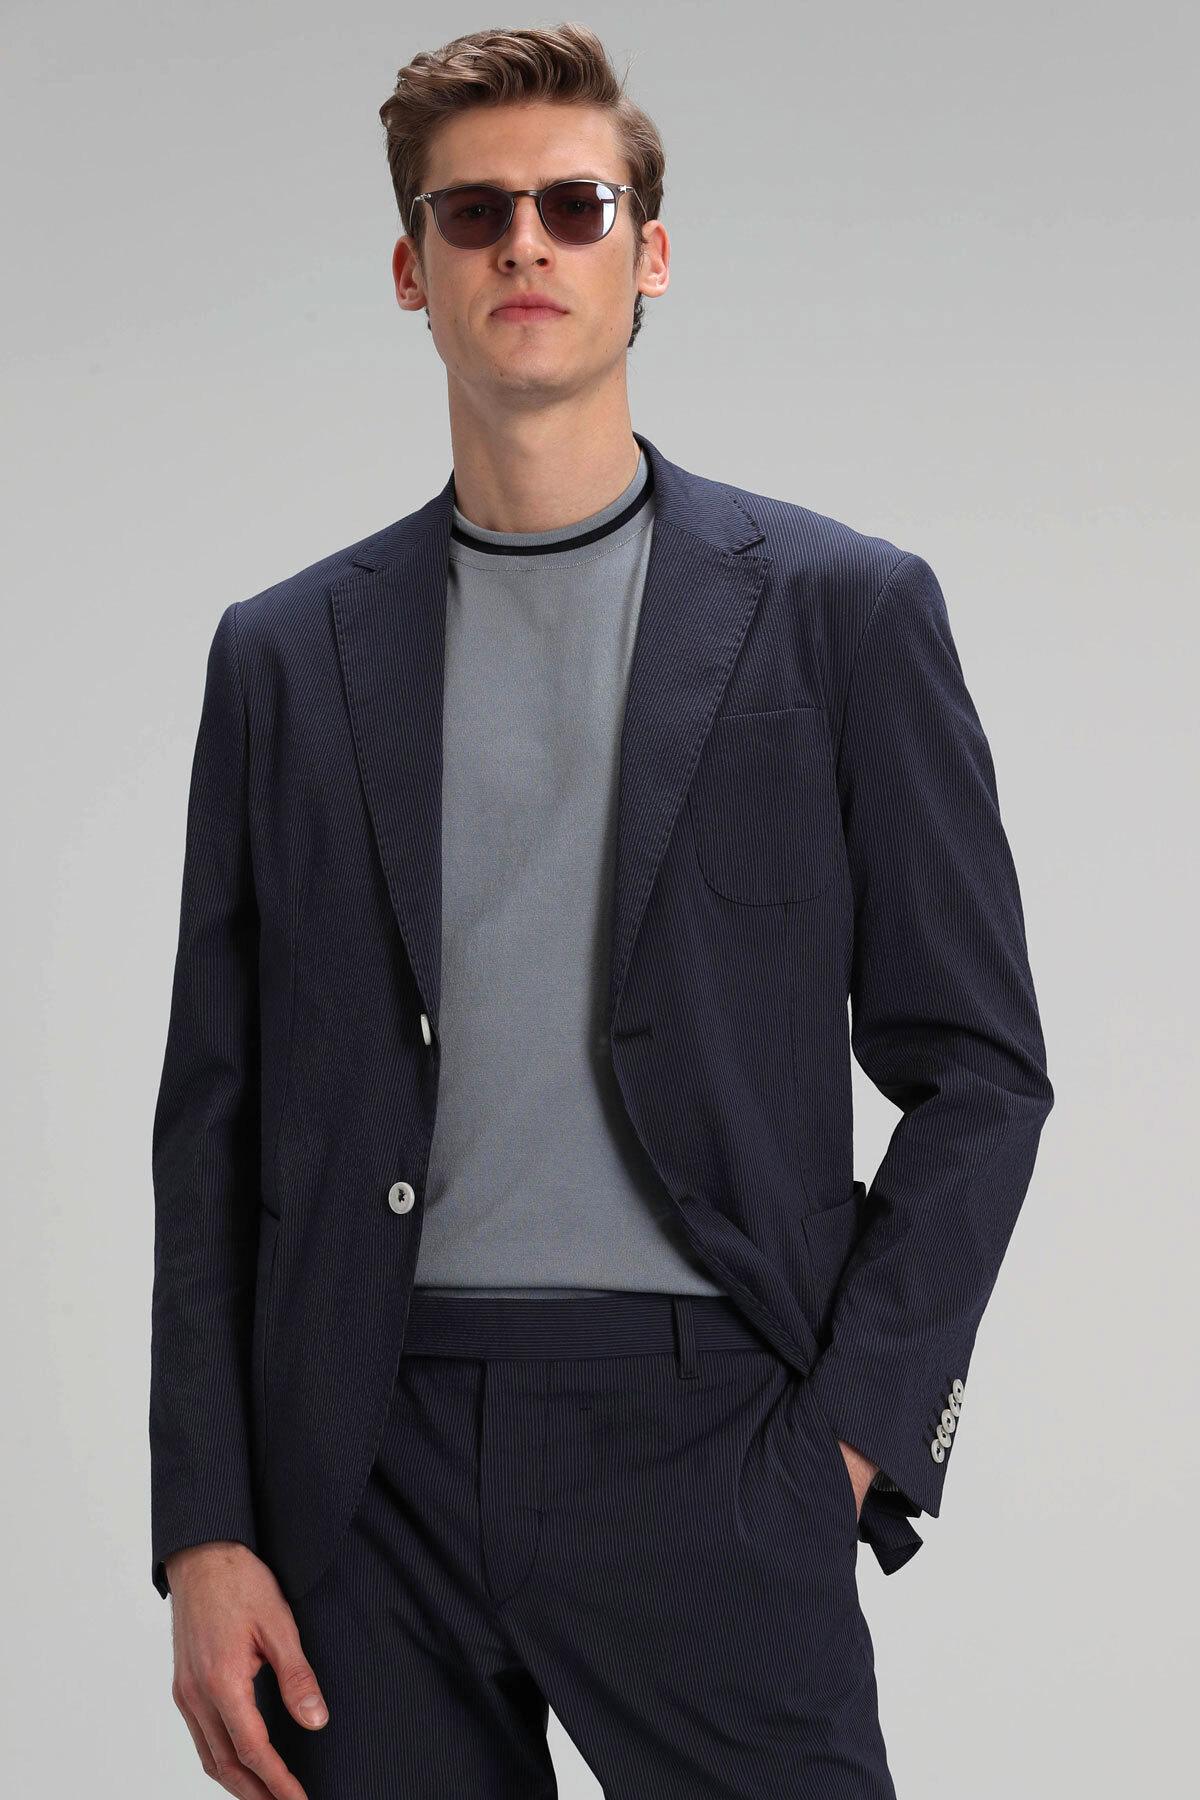 Mendo Spor Blazer Ceket Slim Fit Lacivert